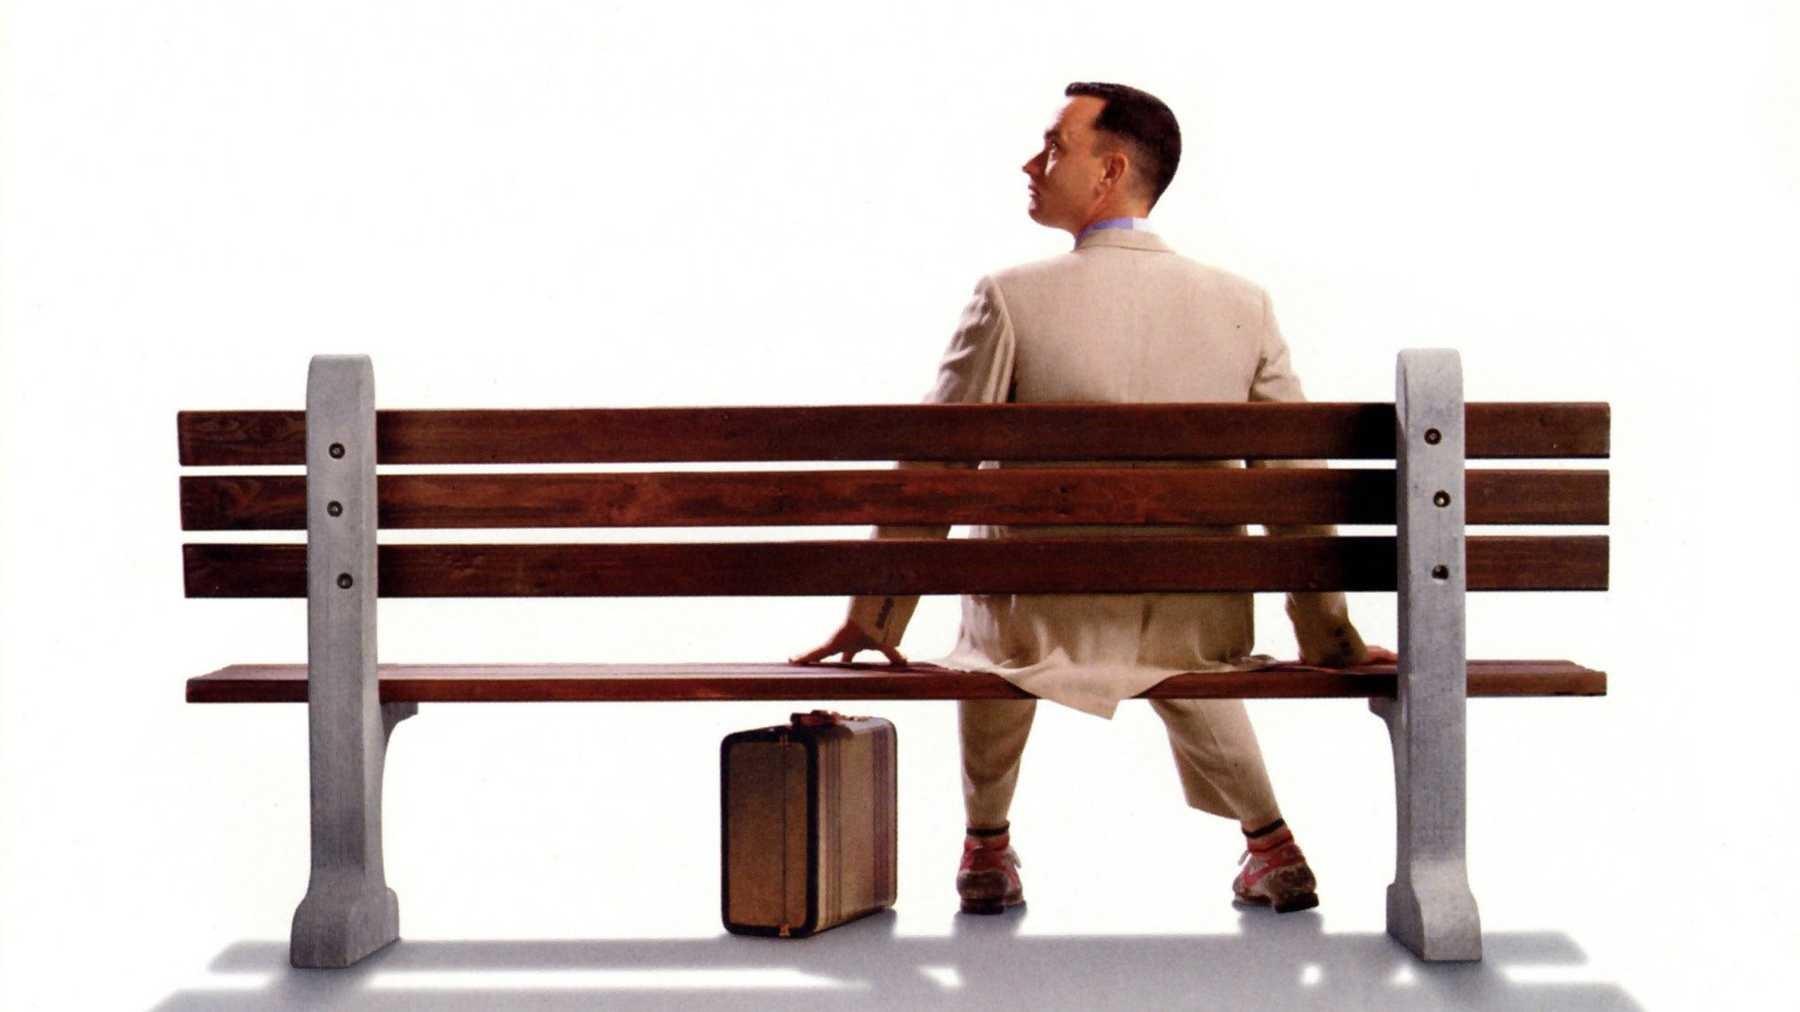 فیلم سینمایی Forrest Gump